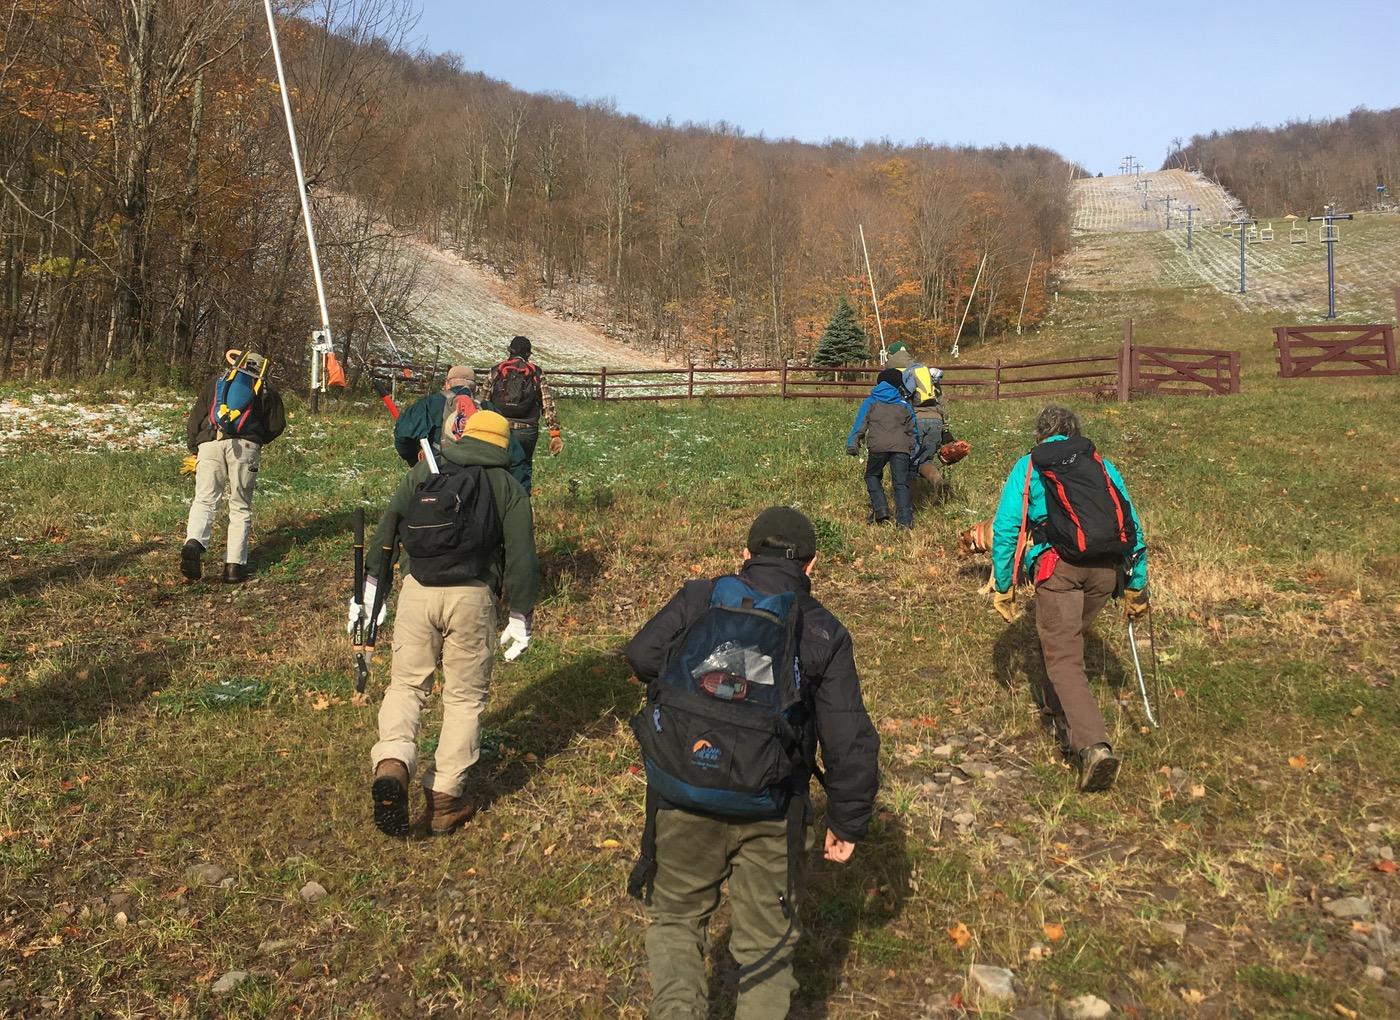 team-hikes-up